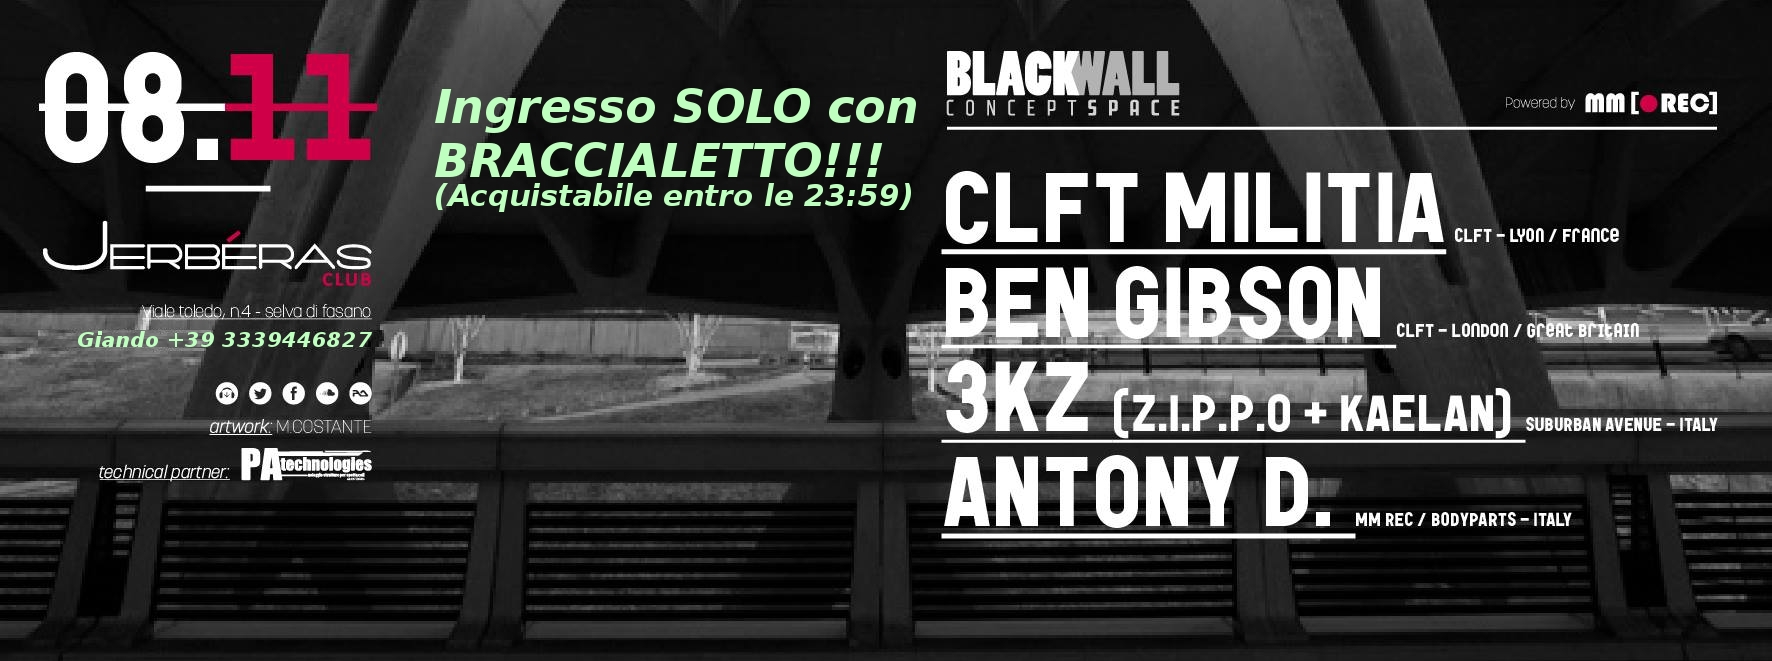 CLFT NIGHT Sabato 8-11 BLACKWALL Concept Space w/ CLFT MILITIA BEN GIBSON 3KZ @ Jerbéras Club